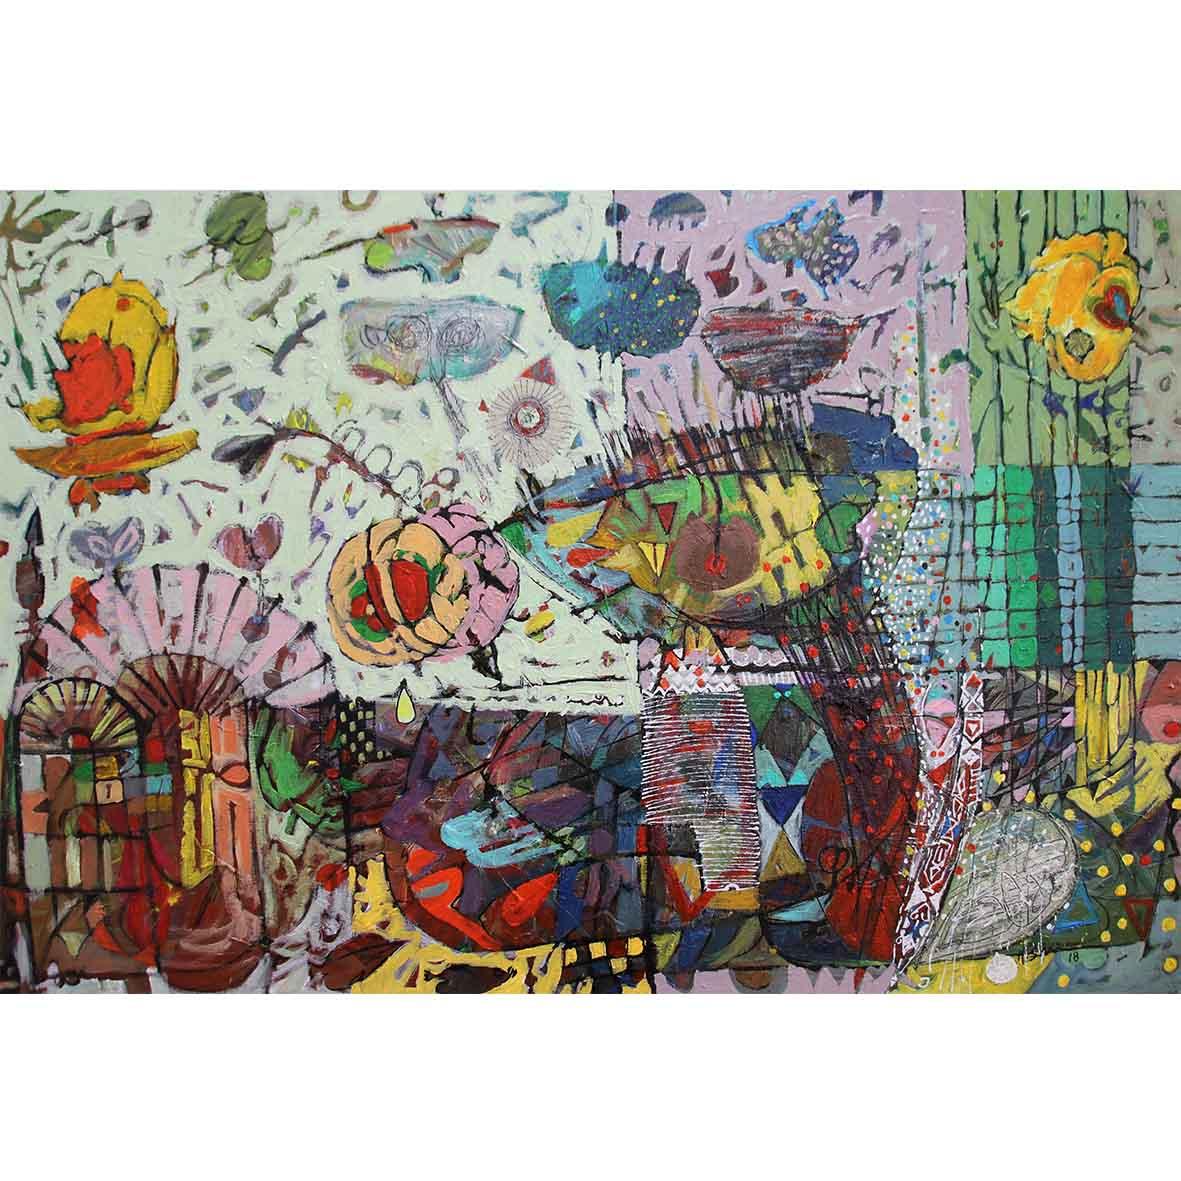 Untitled (HS203) 2018 Acrylic on Canvas 90.5 x 61 cm